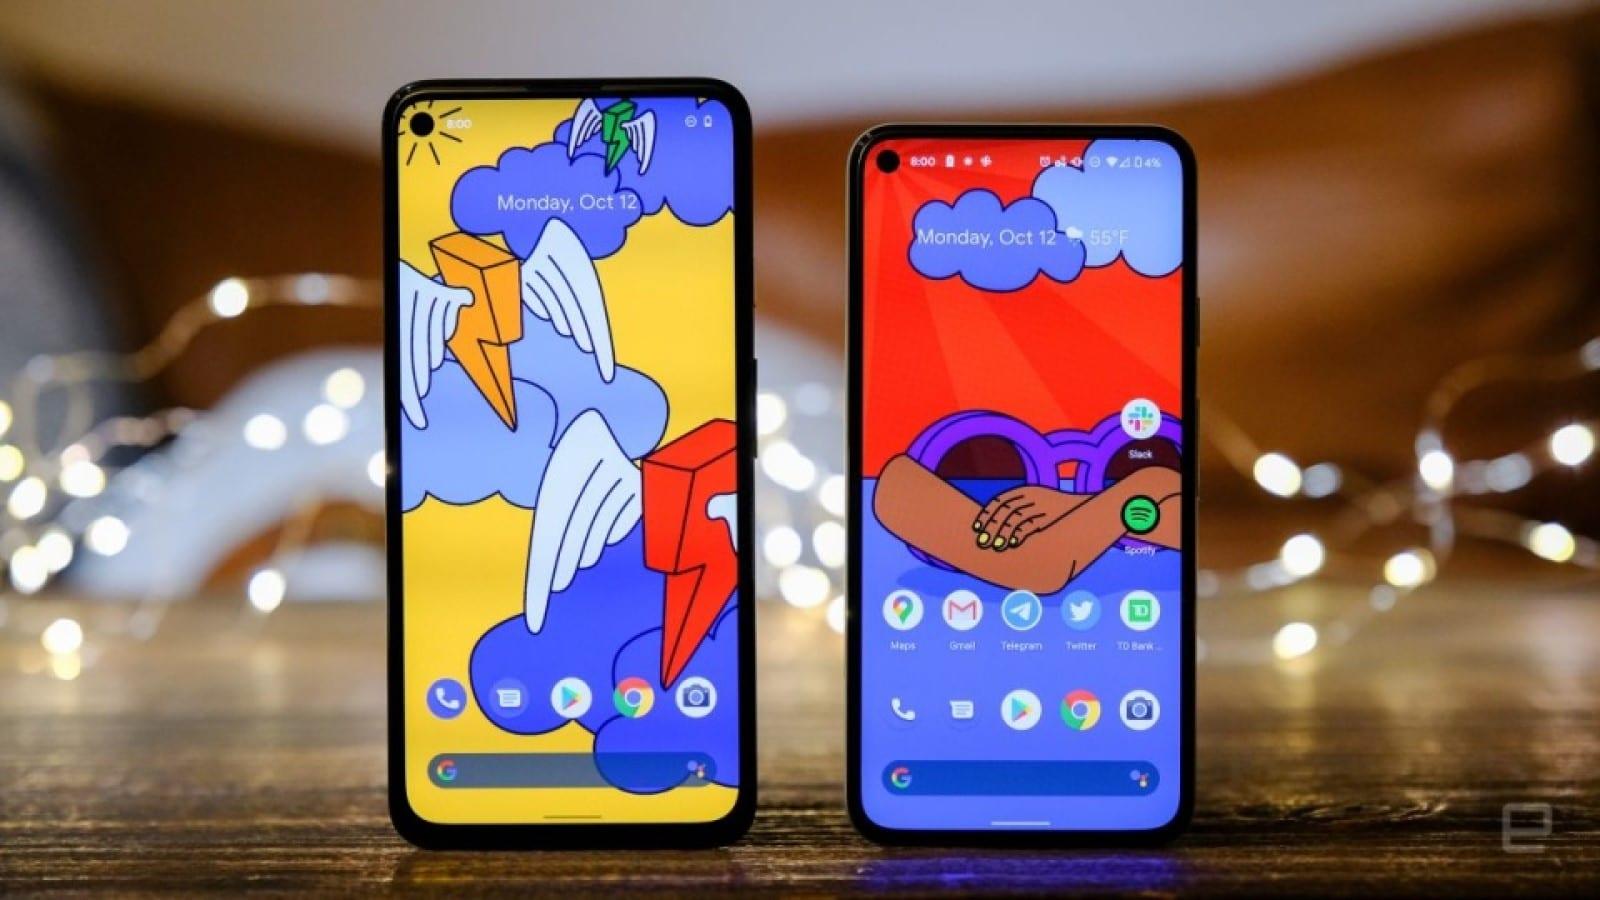 pixel 5 and pixel 4a 5g smartphones